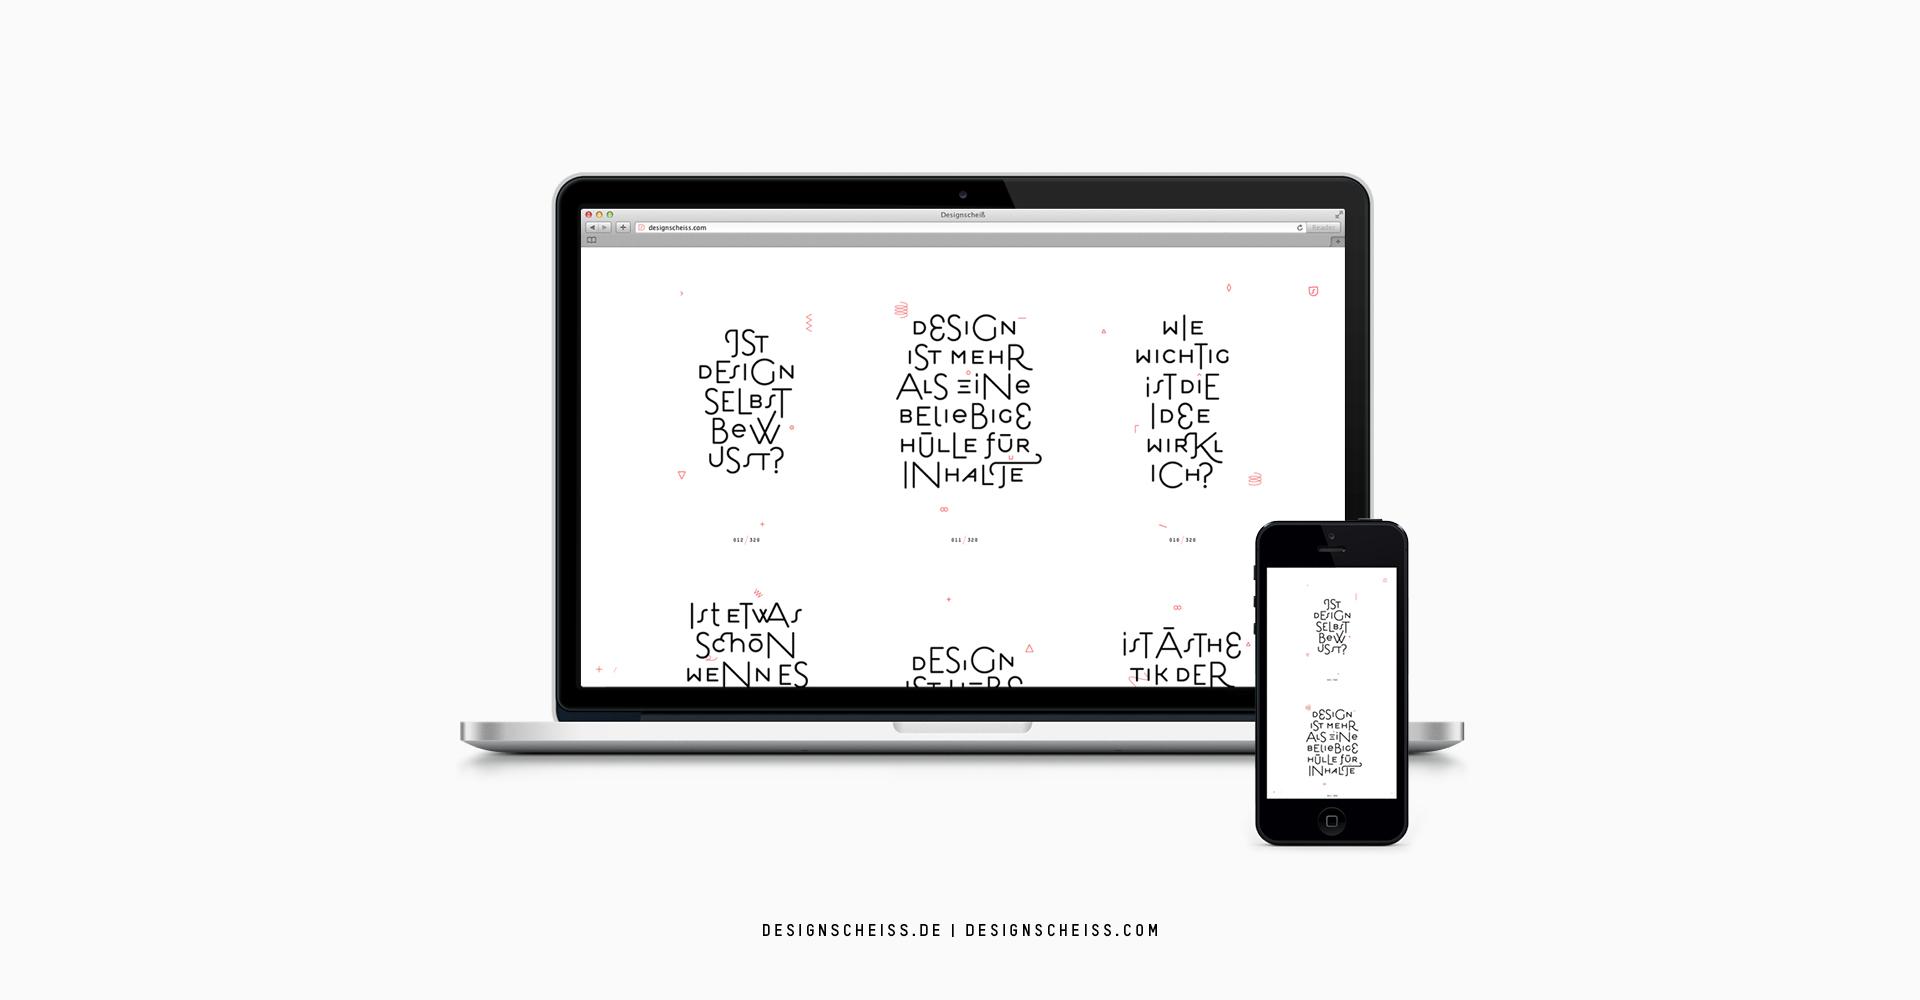 Designscheiss_0013